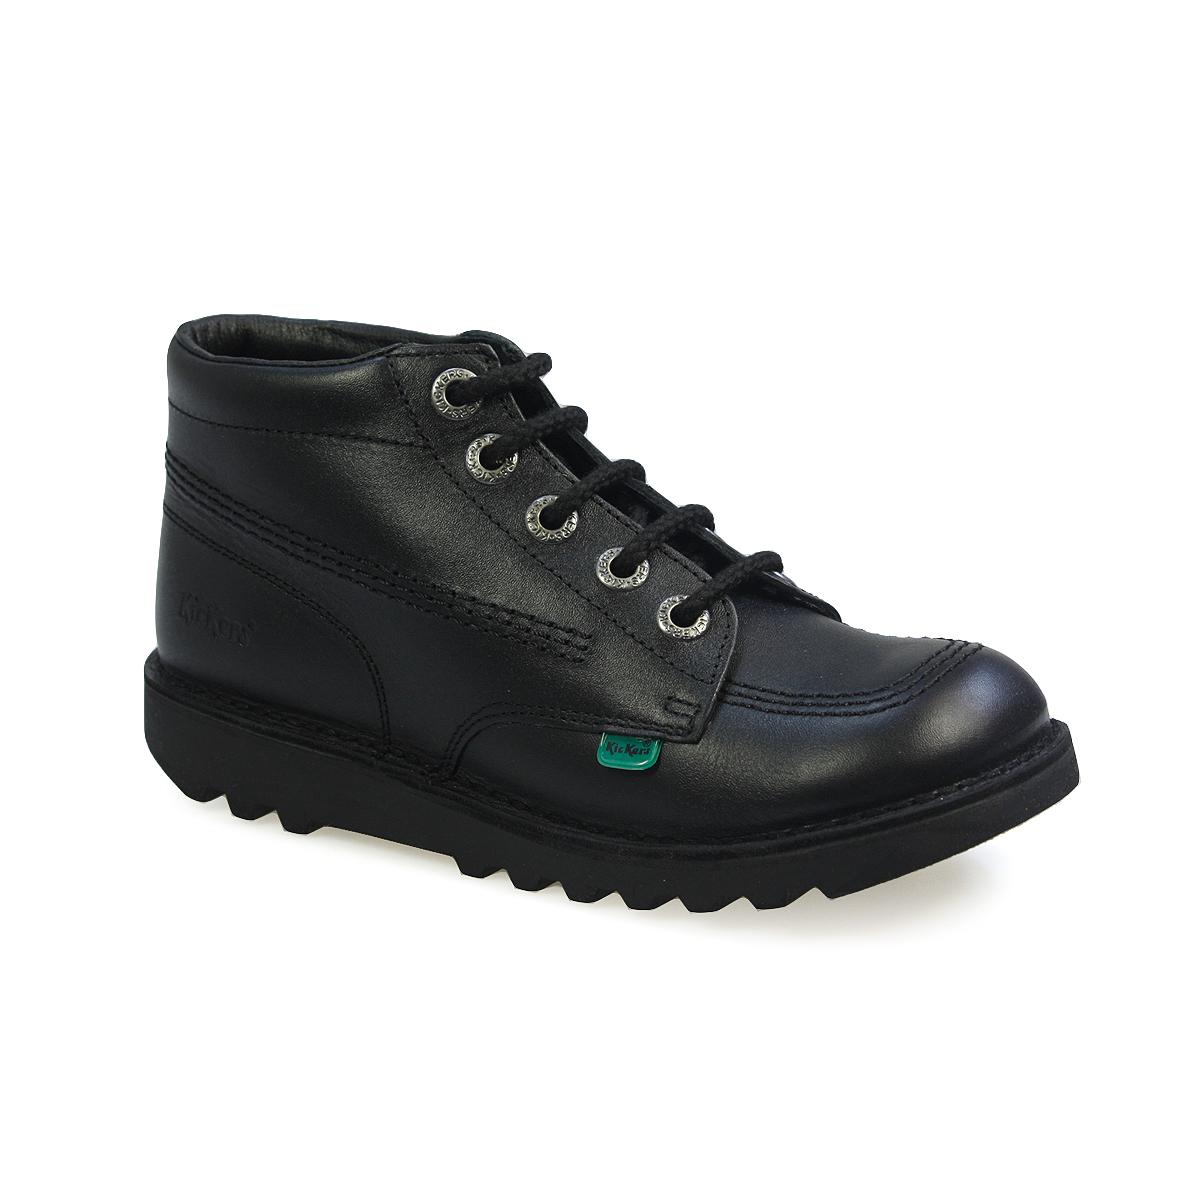 Black kicker sandals - Kickers Kick Hi Core Youth Kids Black Leather Lace Up Ankle Boots Size 3 6 5